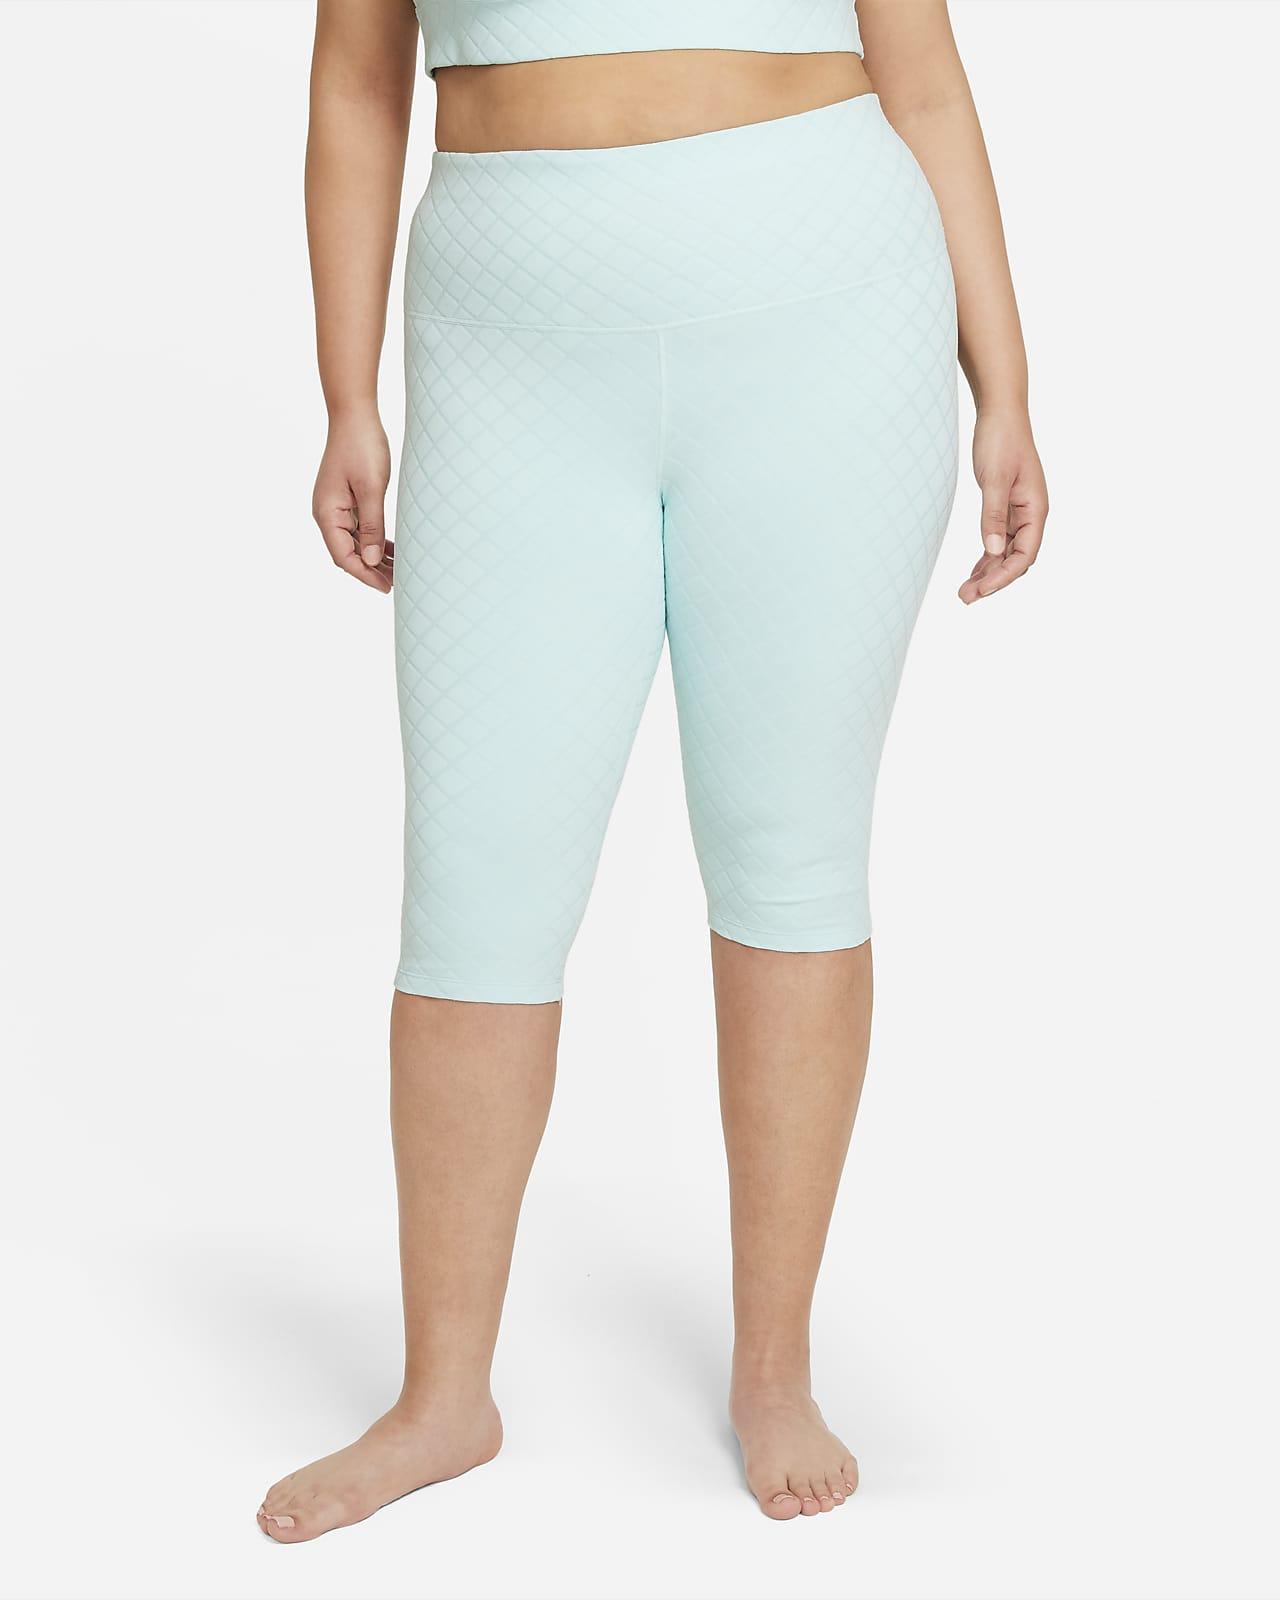 Leggings Capri de cintura alta jacquard talla grande para mujer Nike Yoga Luxe